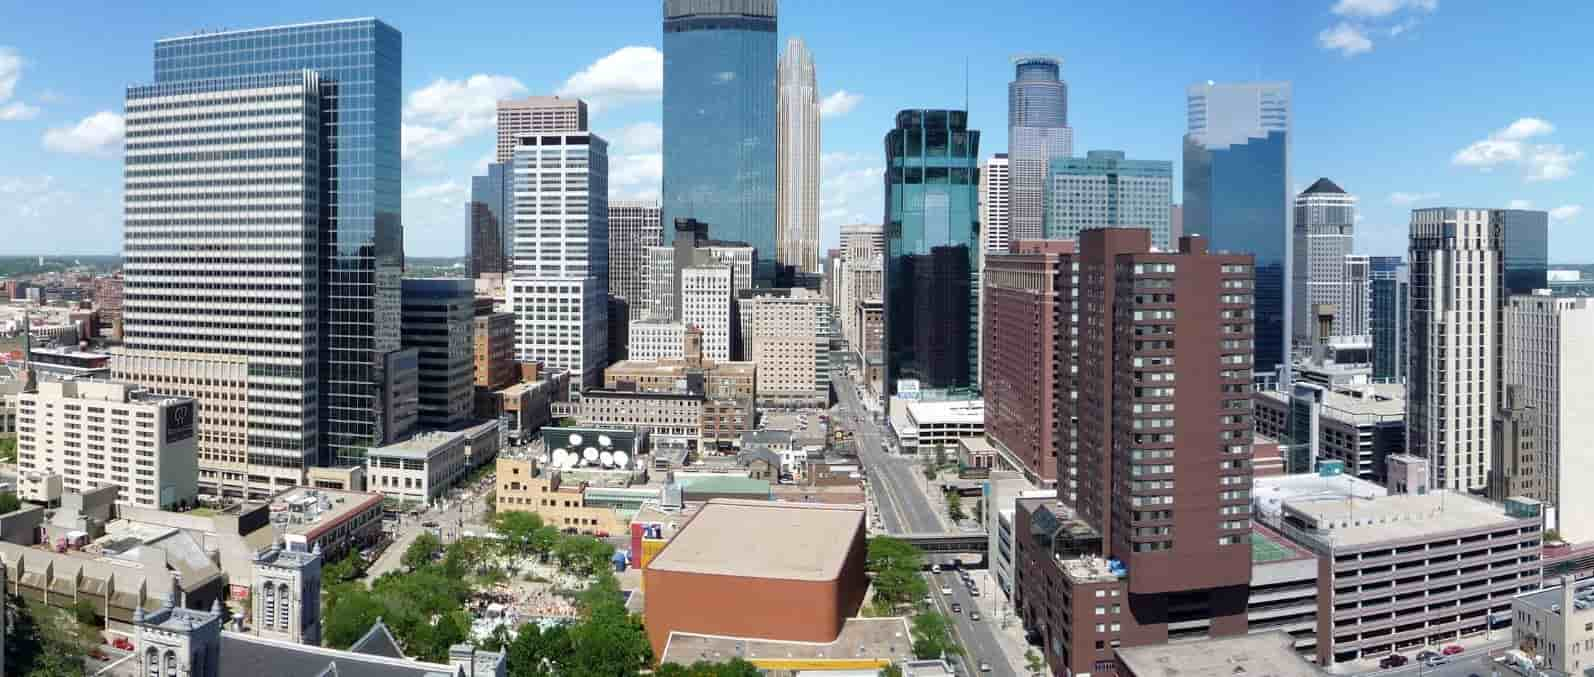 The Best Millennial Neighborhoods in Minneapolis-Saint Paul in 2019